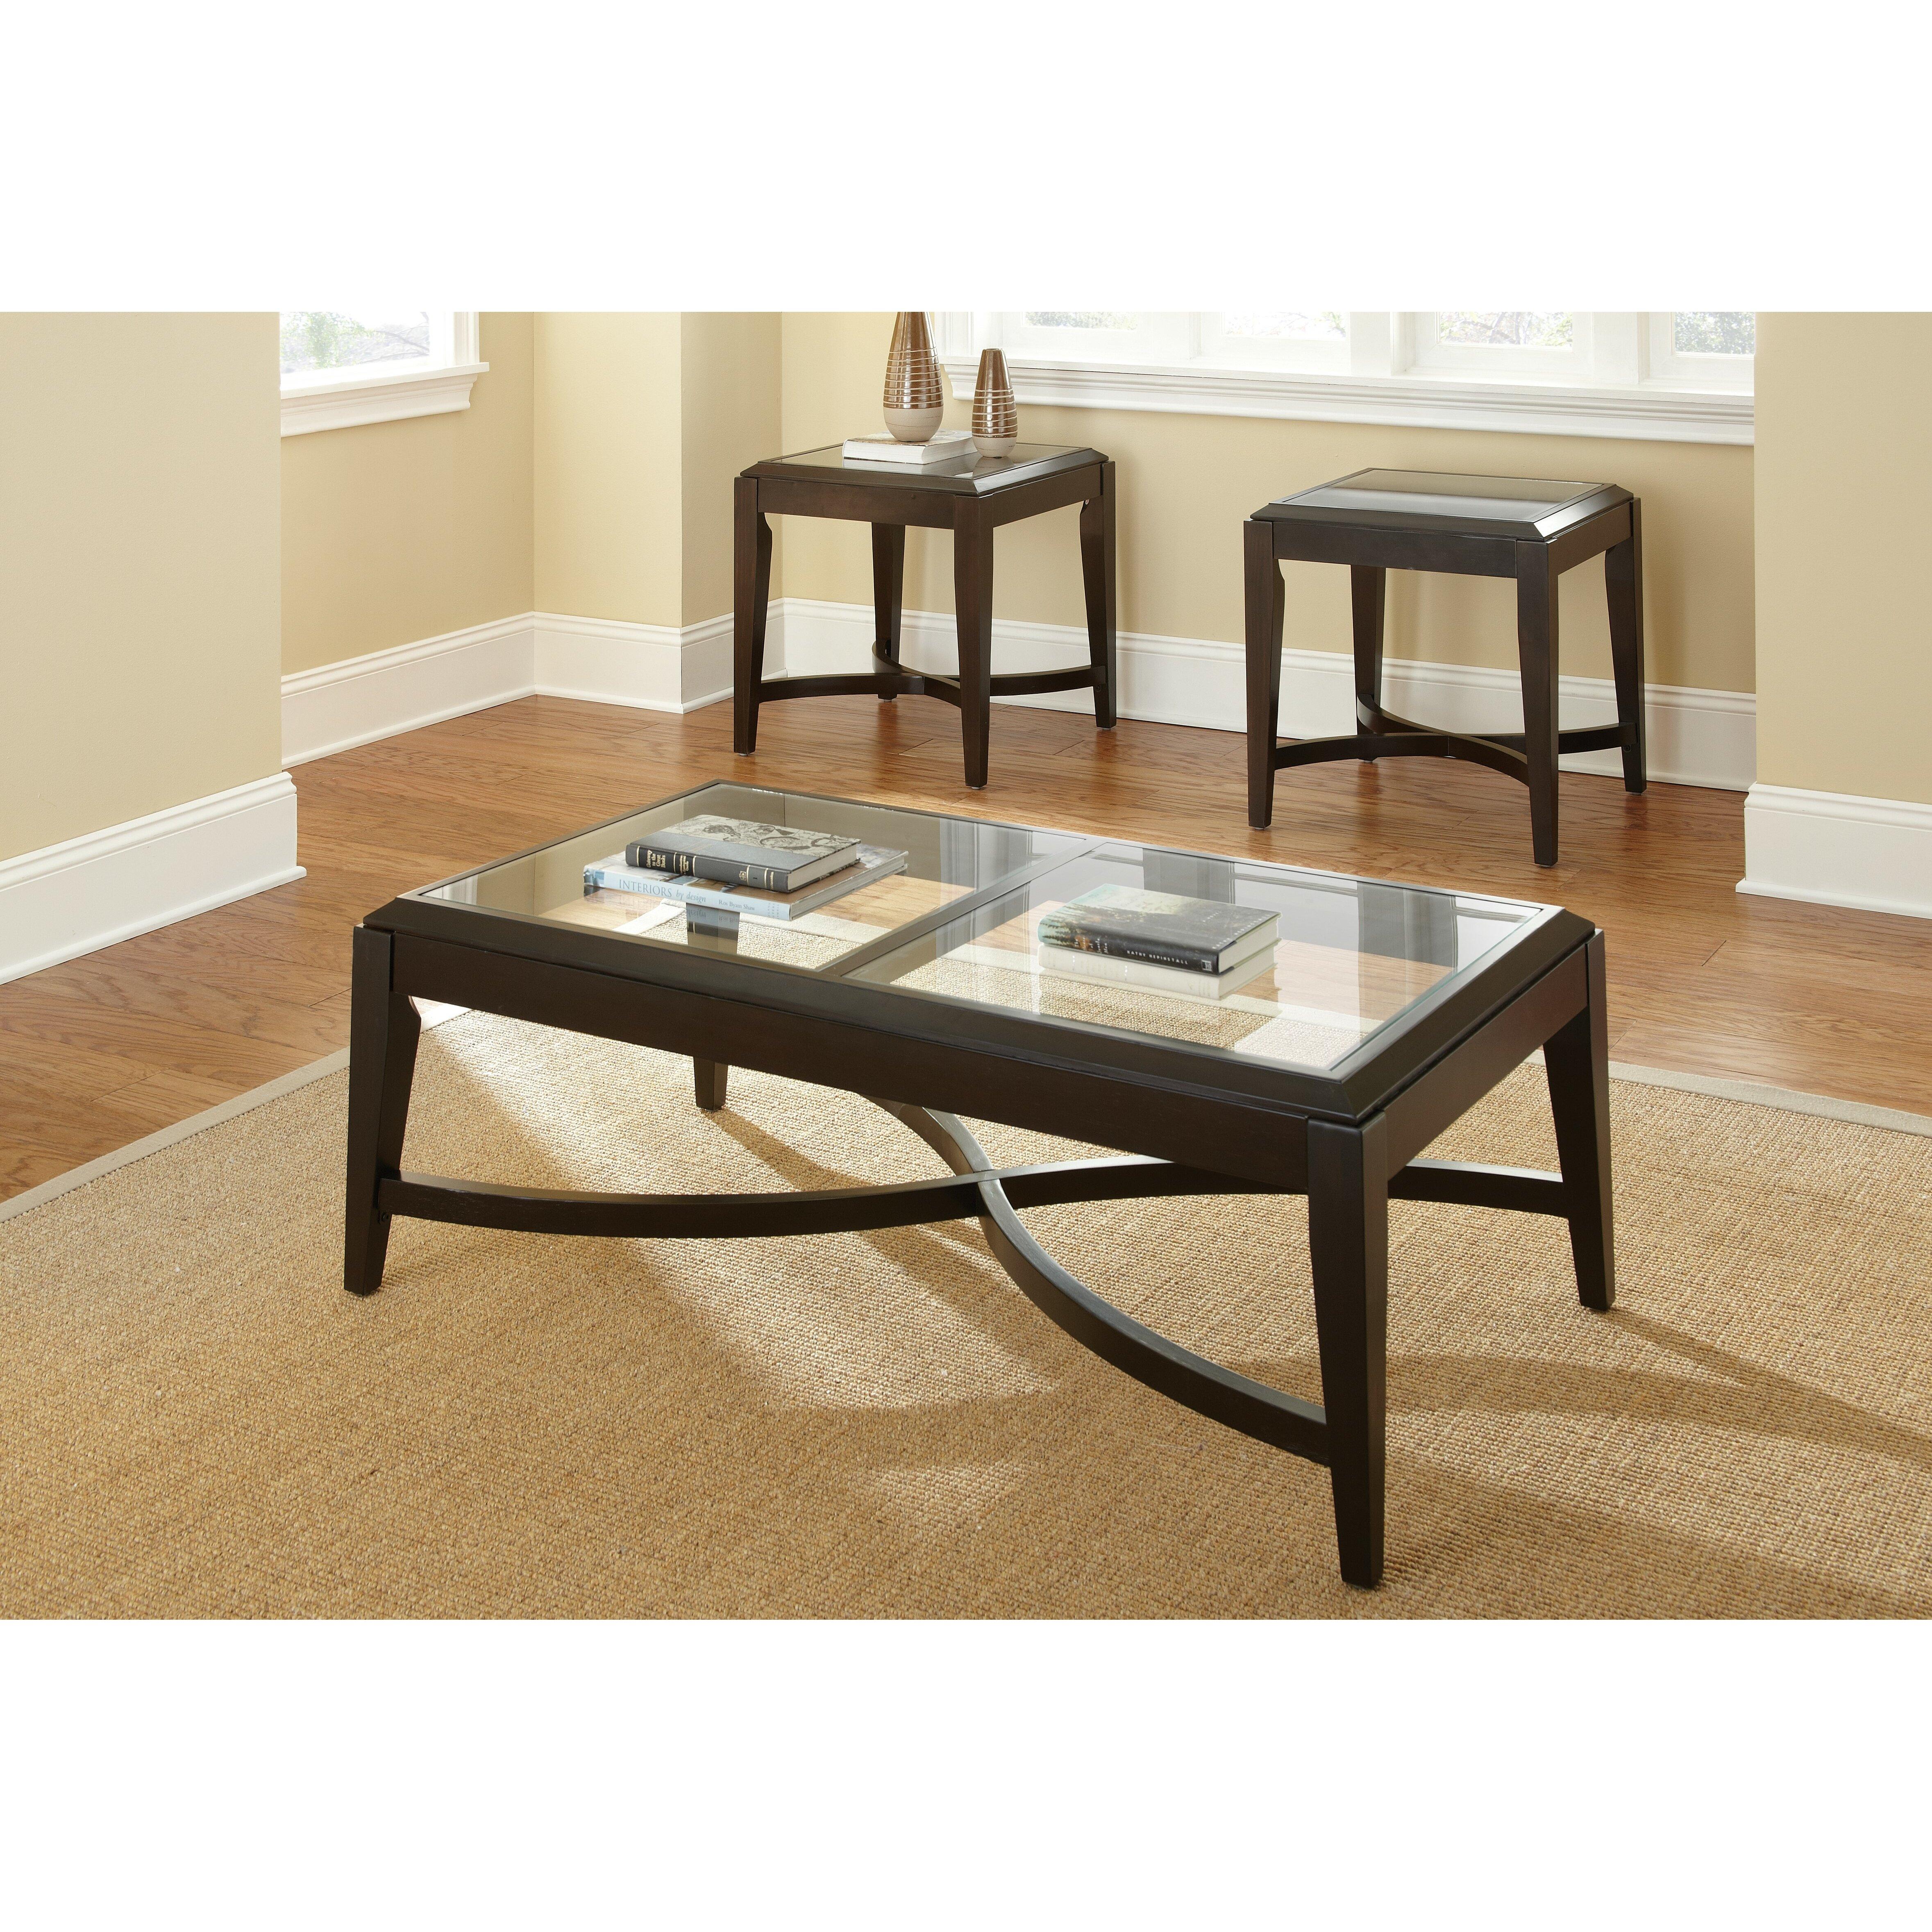 Steve Silver Furniture Mayfield 3 Piece Coffee Table Set Reviews Wayfair